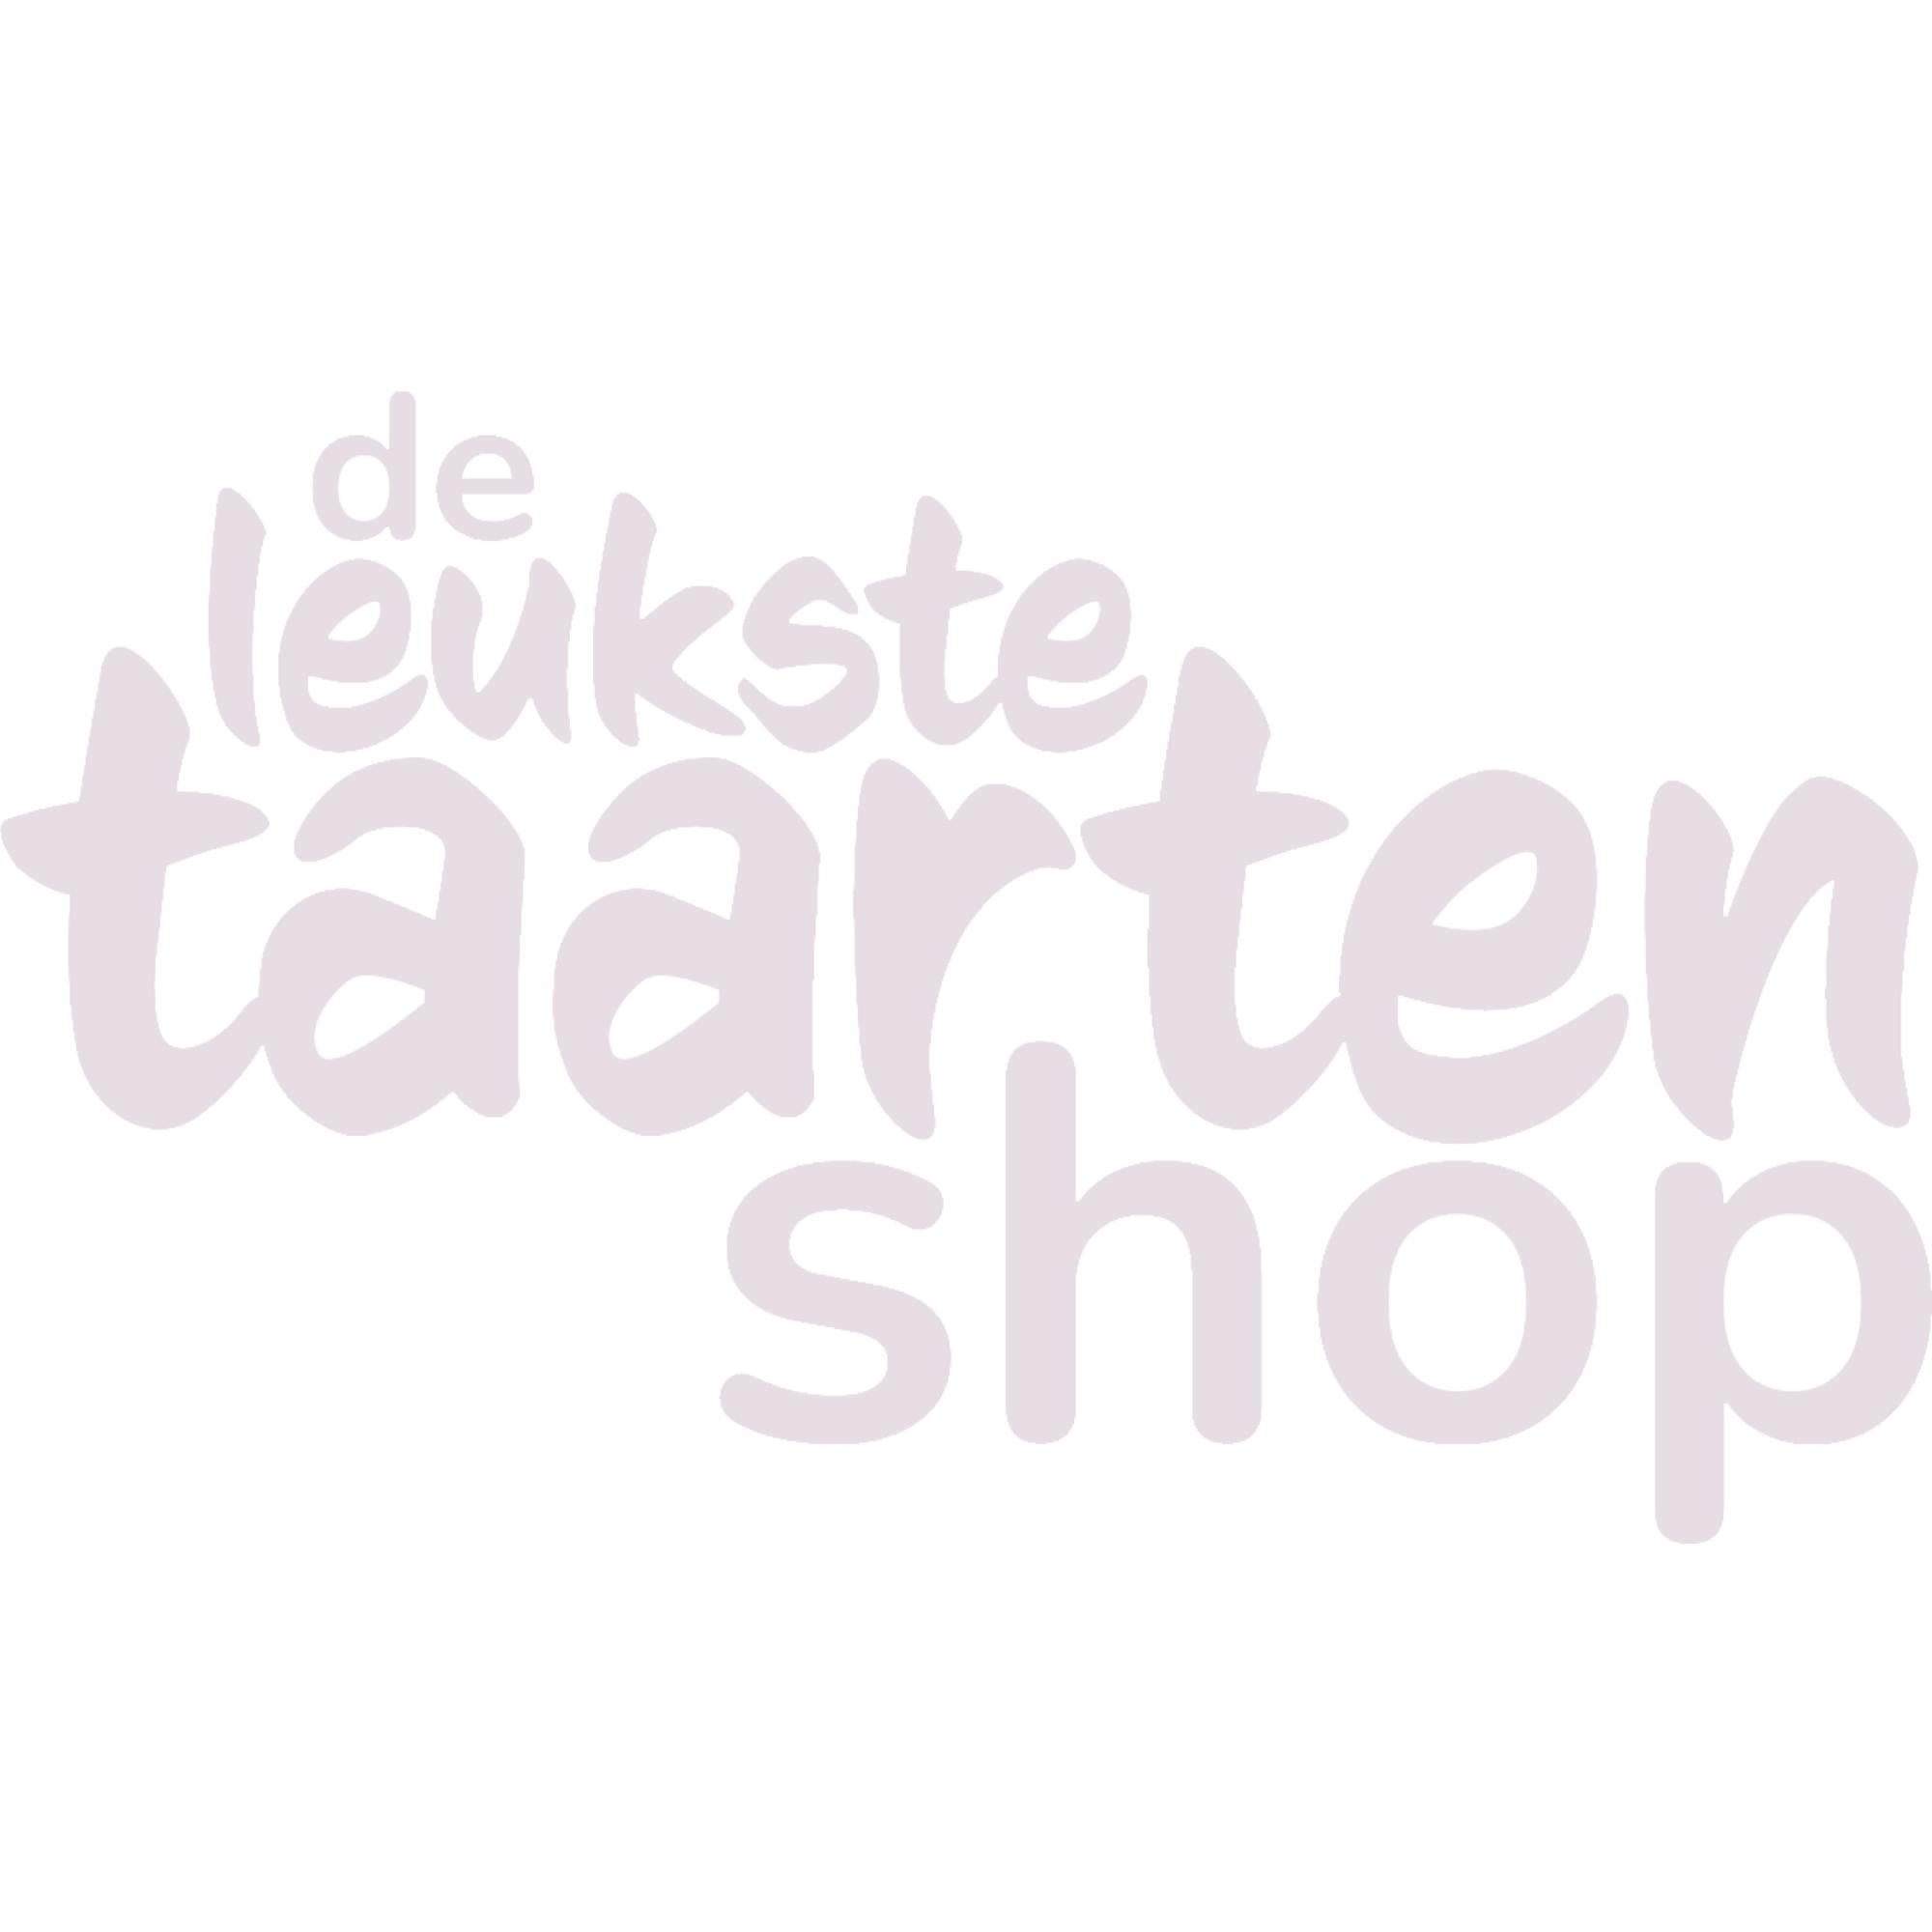 http://www.deleukstetaartenshop.nl/media/catalog/product/cache/1/image/304x304/9df78eab33525d08d6e5fb8d27136e95/1/2/12463.jpg